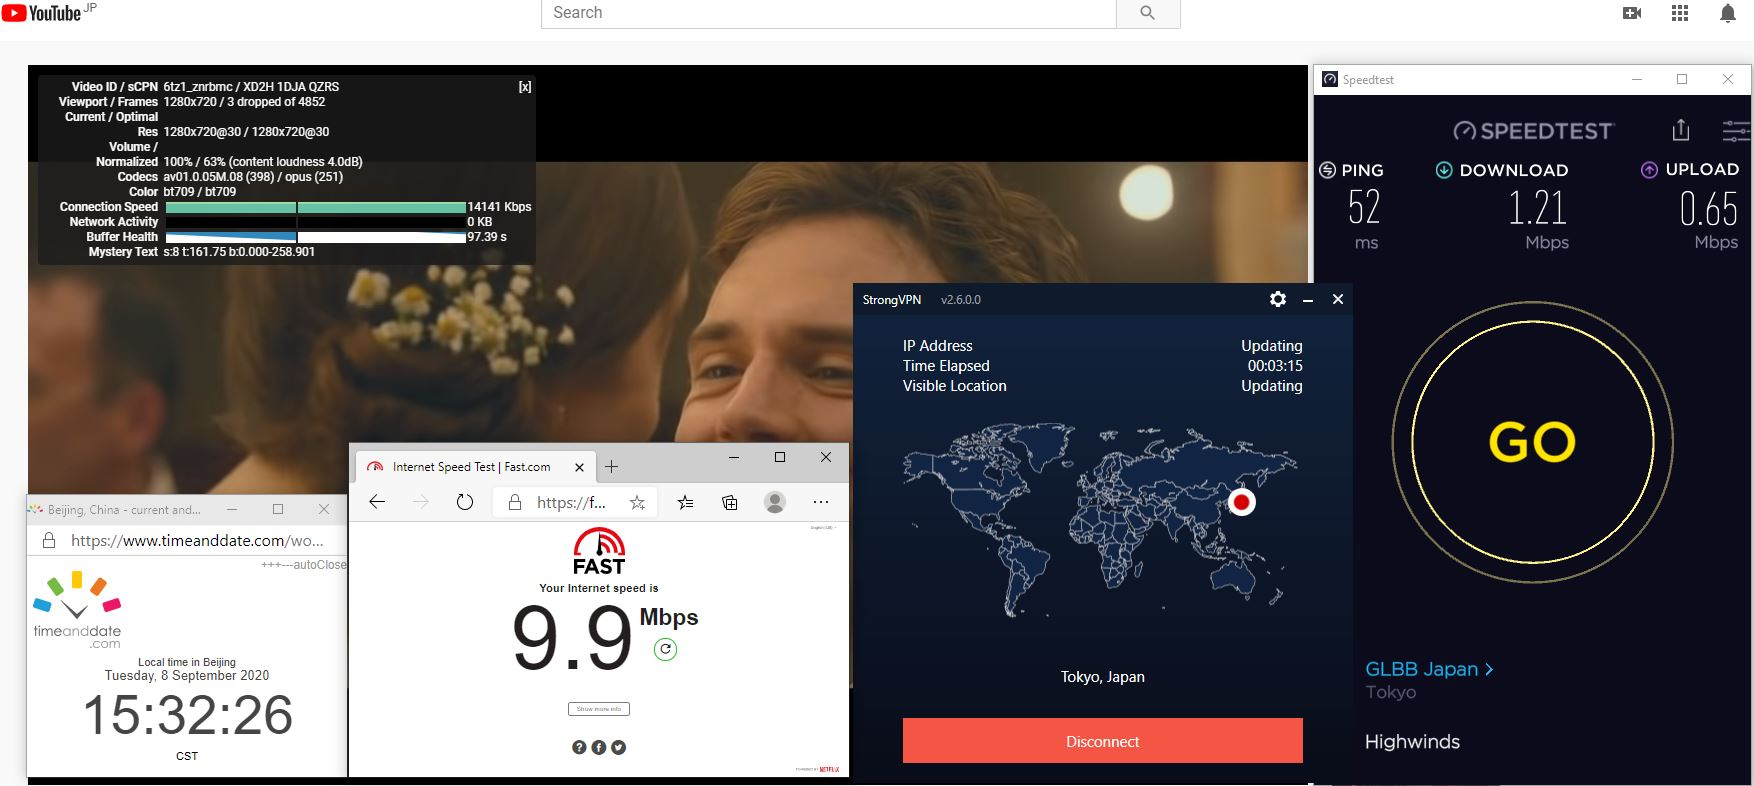 Windows10 StrongVPN Tokyo - Japan 中国VPN 翻墙 科学上网 翻墙速度测试 - 20200908